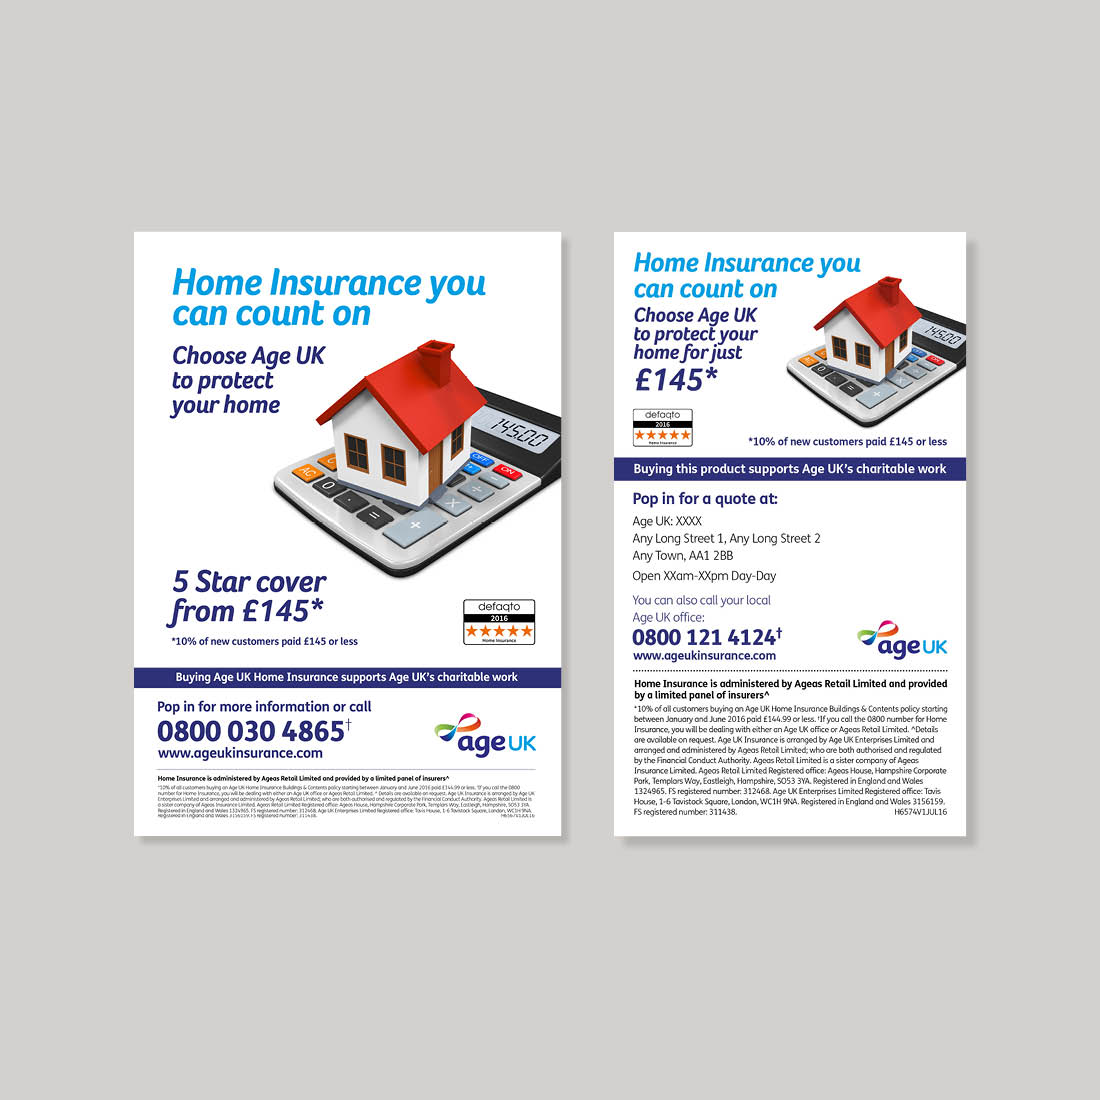 Age UK Home Insurance